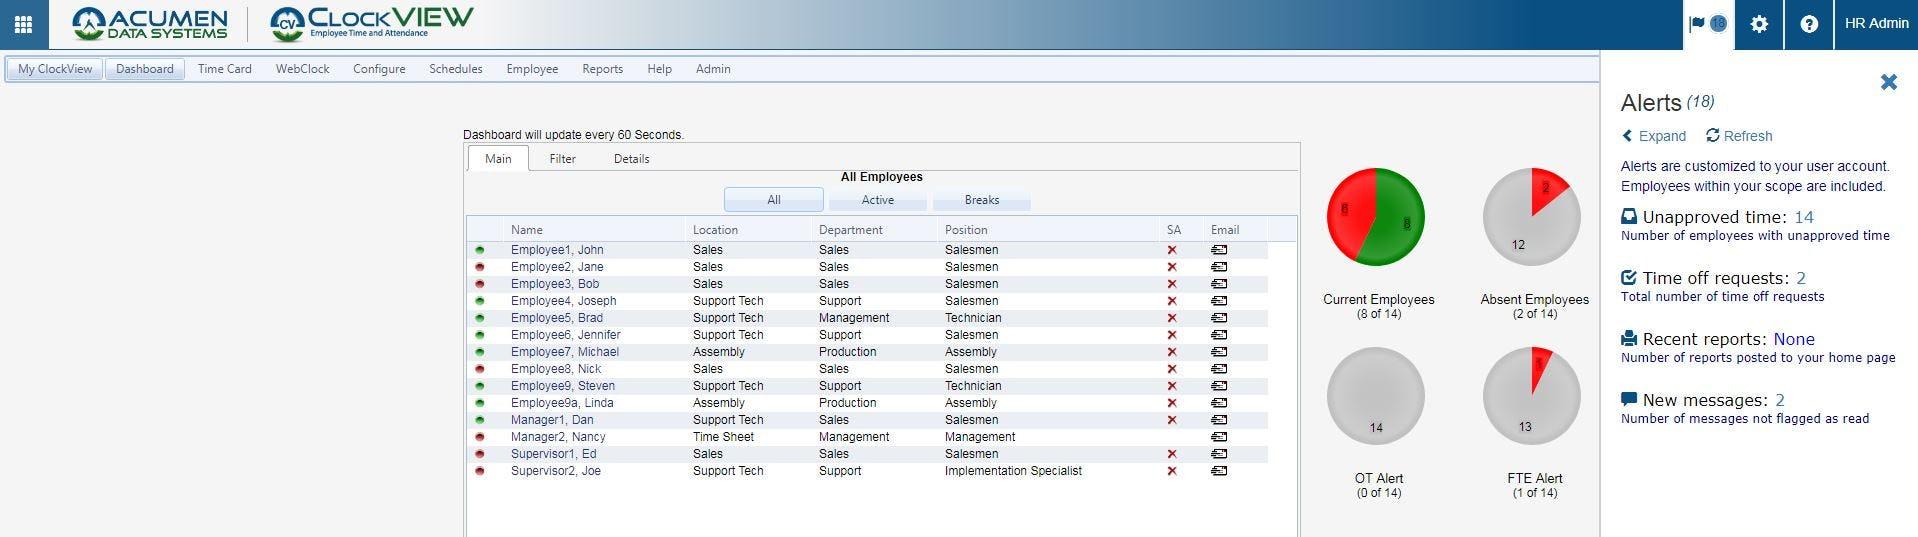 ClockVIEW Software - ClockVIEW dashboard